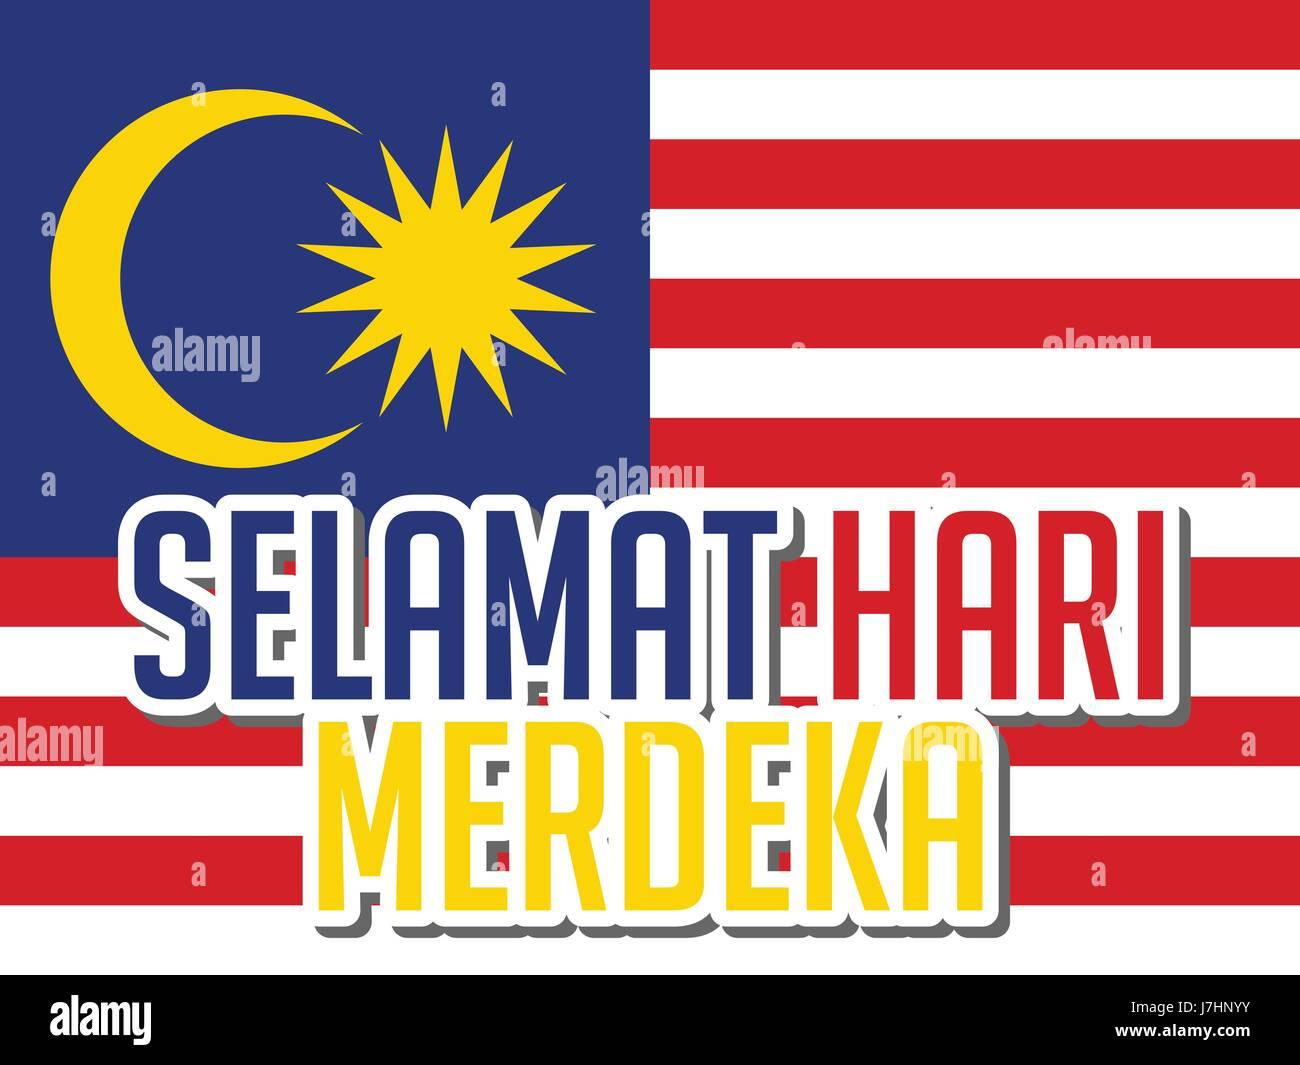 Hari Merdeka High Resolution Stock Photography And Images Alamy